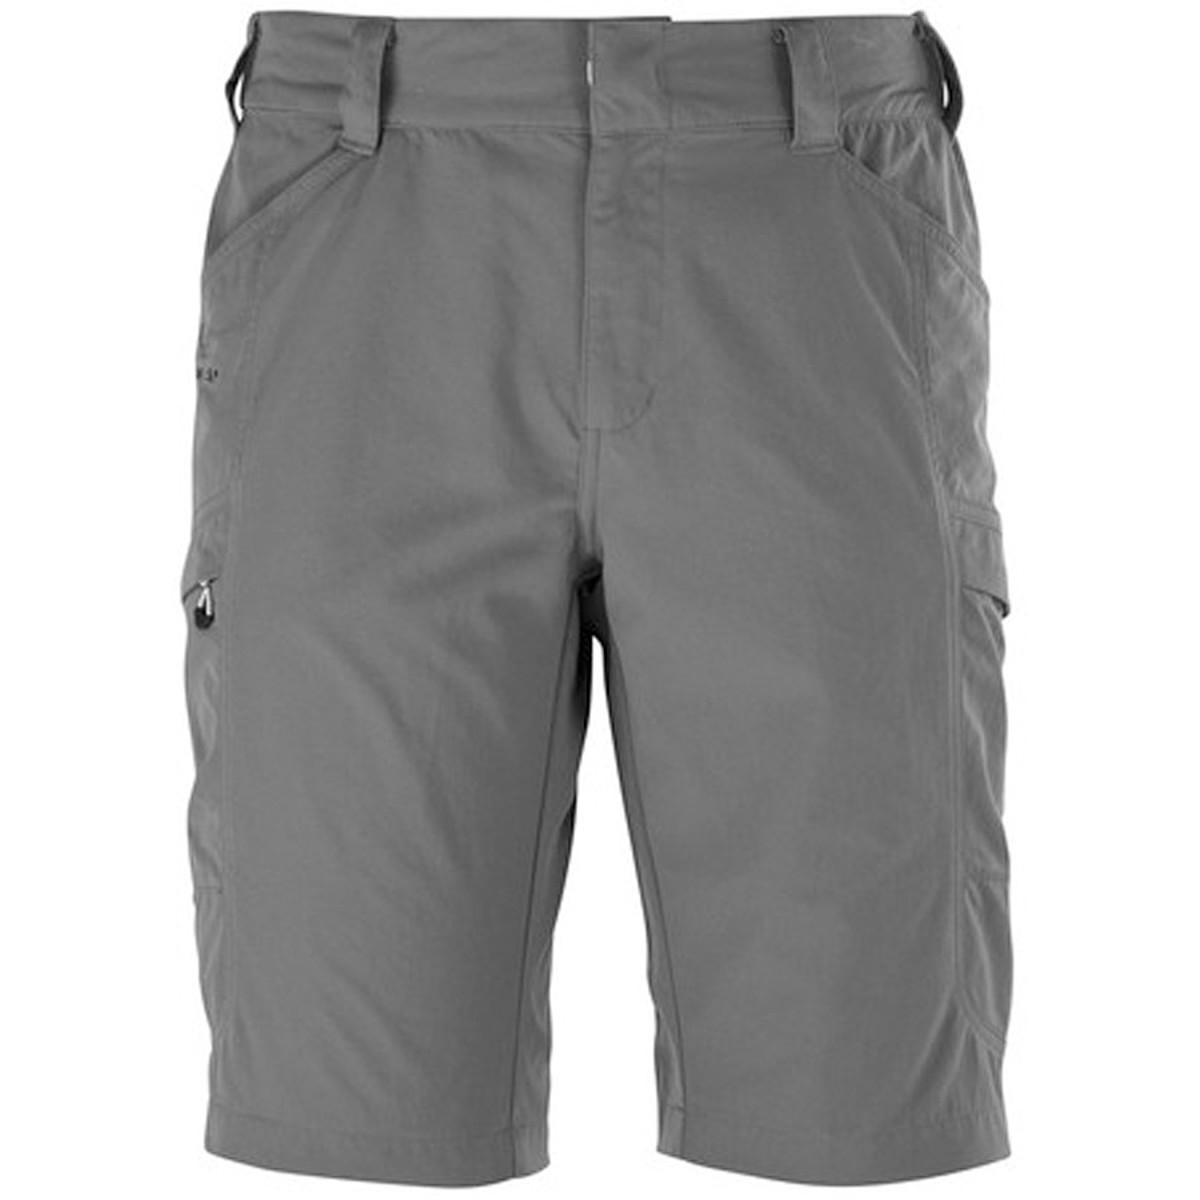 Eider Galapagos Bermuda Short